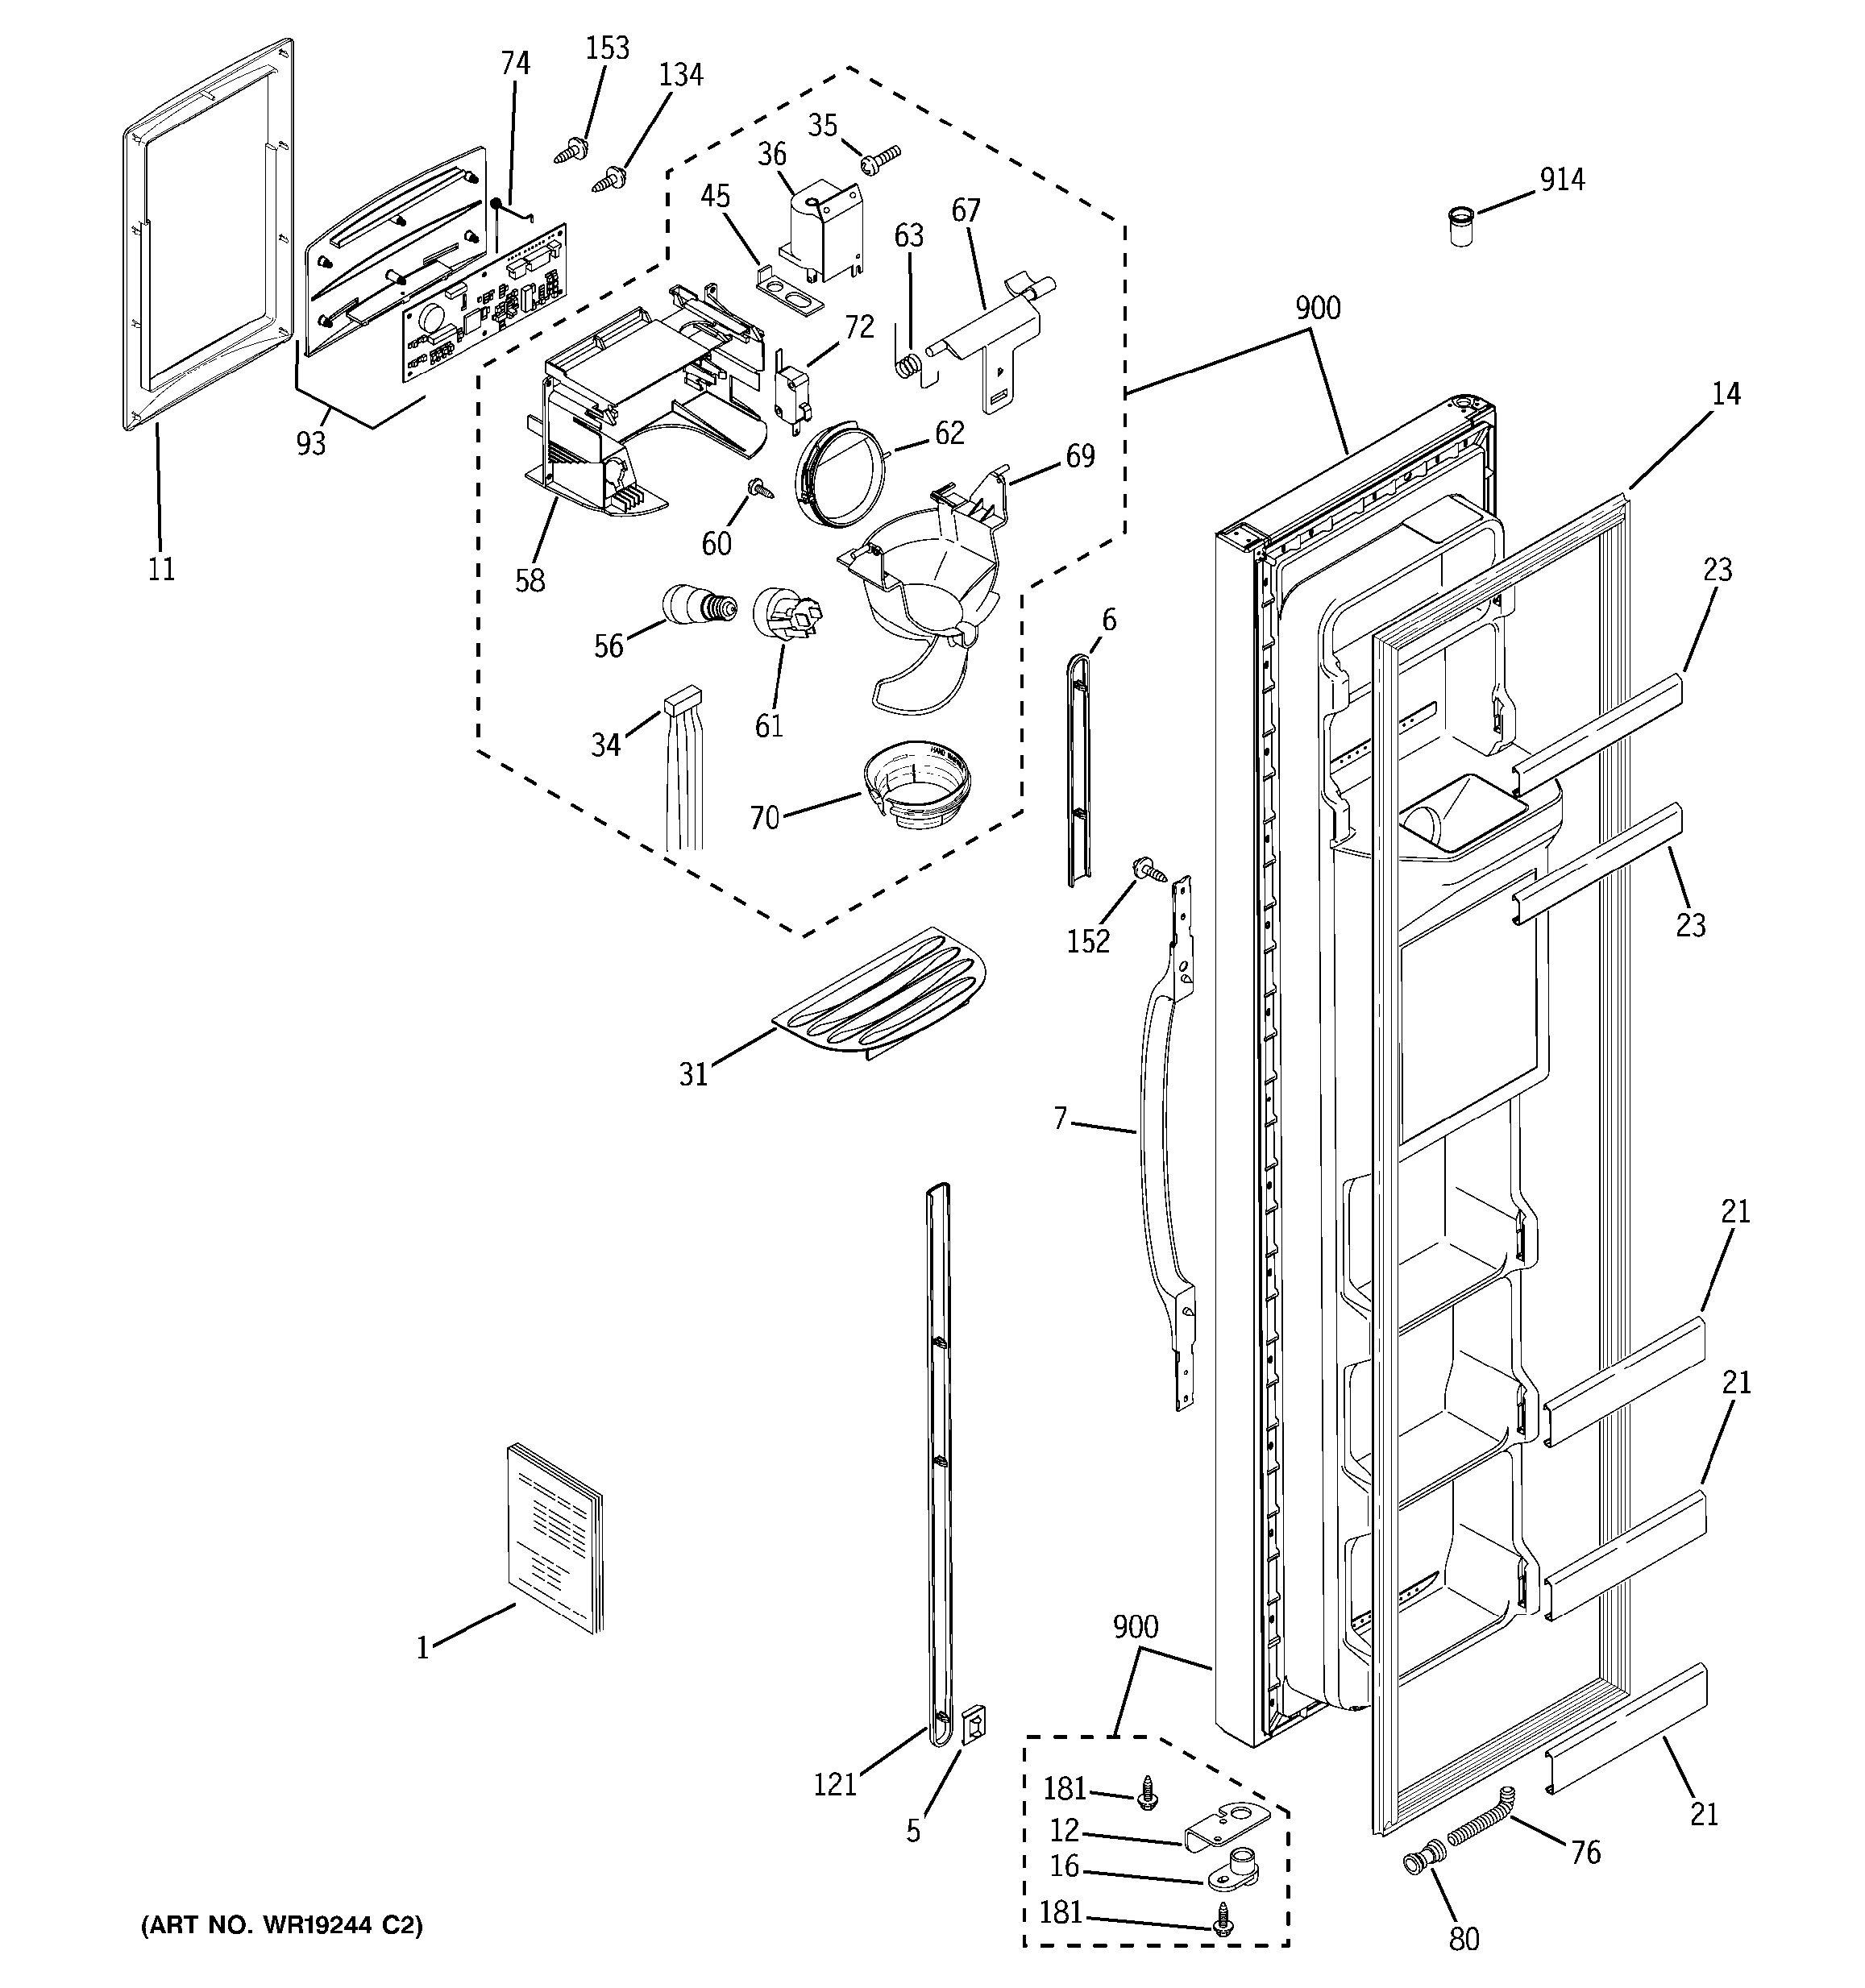 Freezer Wiring Diagram Of Plate